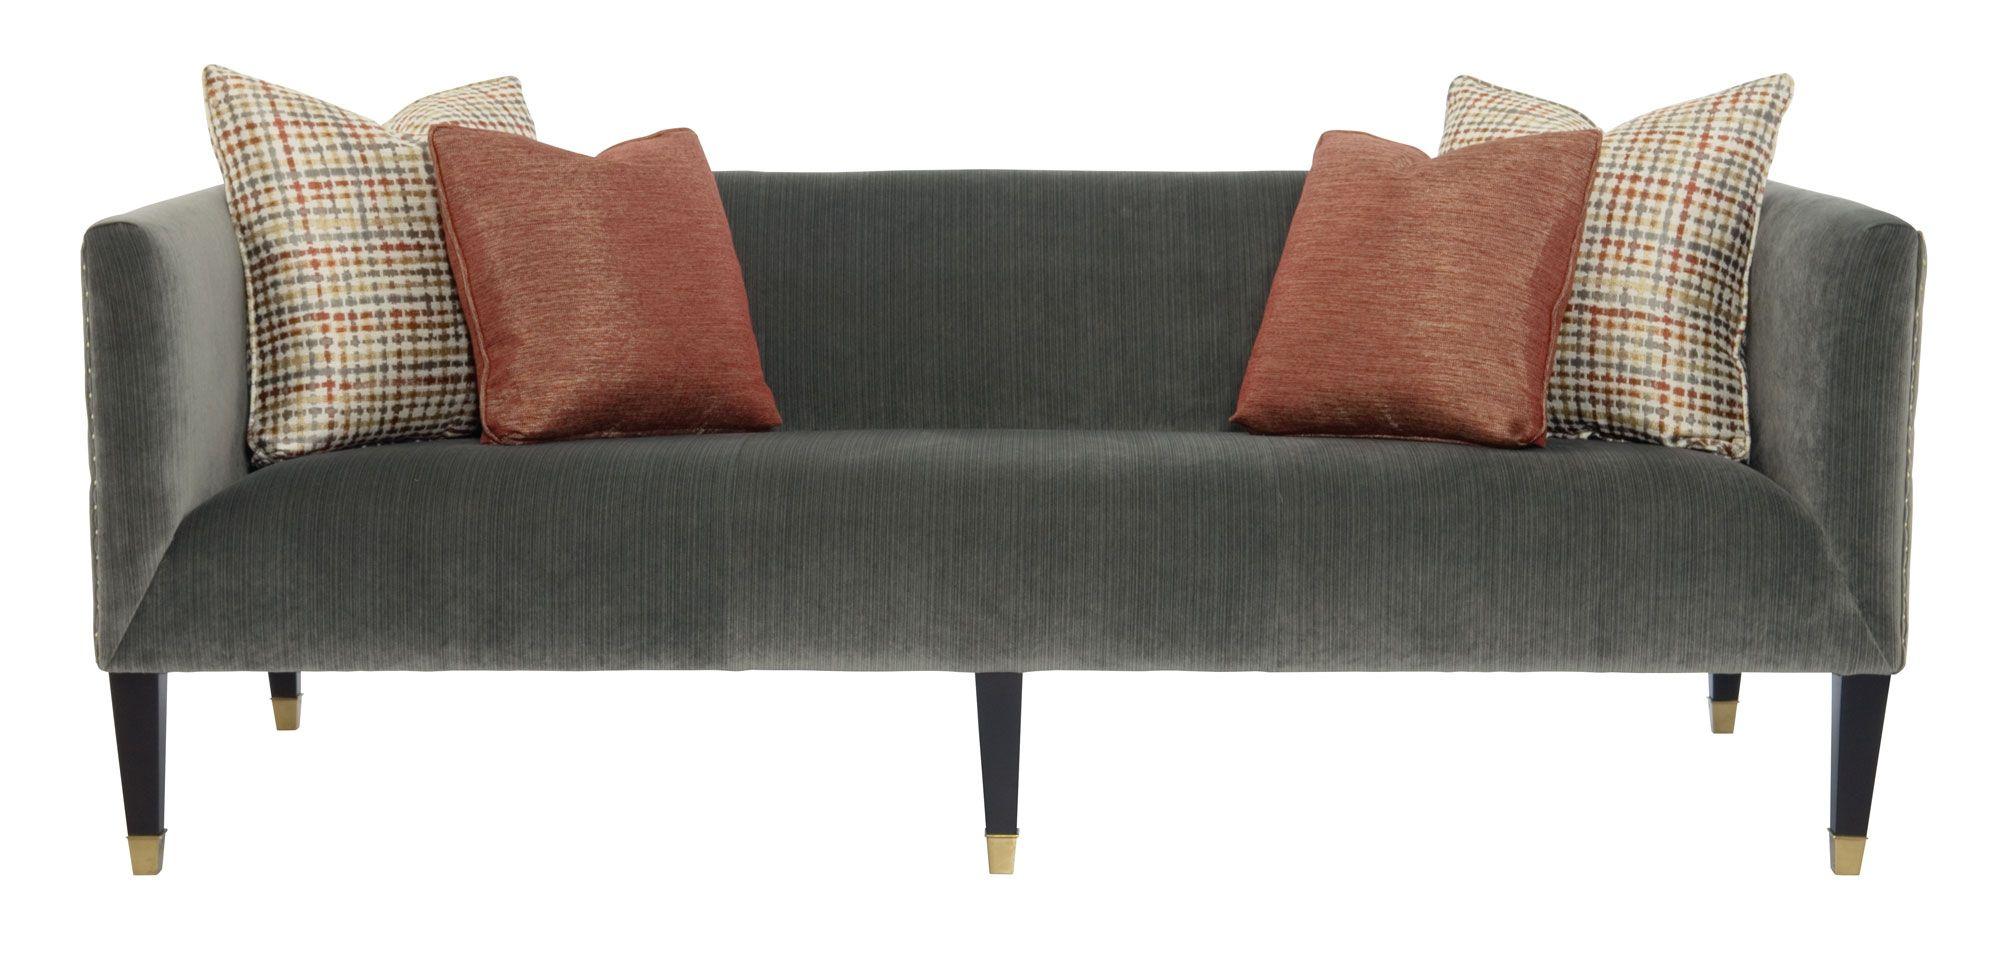 Sofa 108 1 2 In Bernhardt Interiors Pinterest Living Rooms Room And Ideas